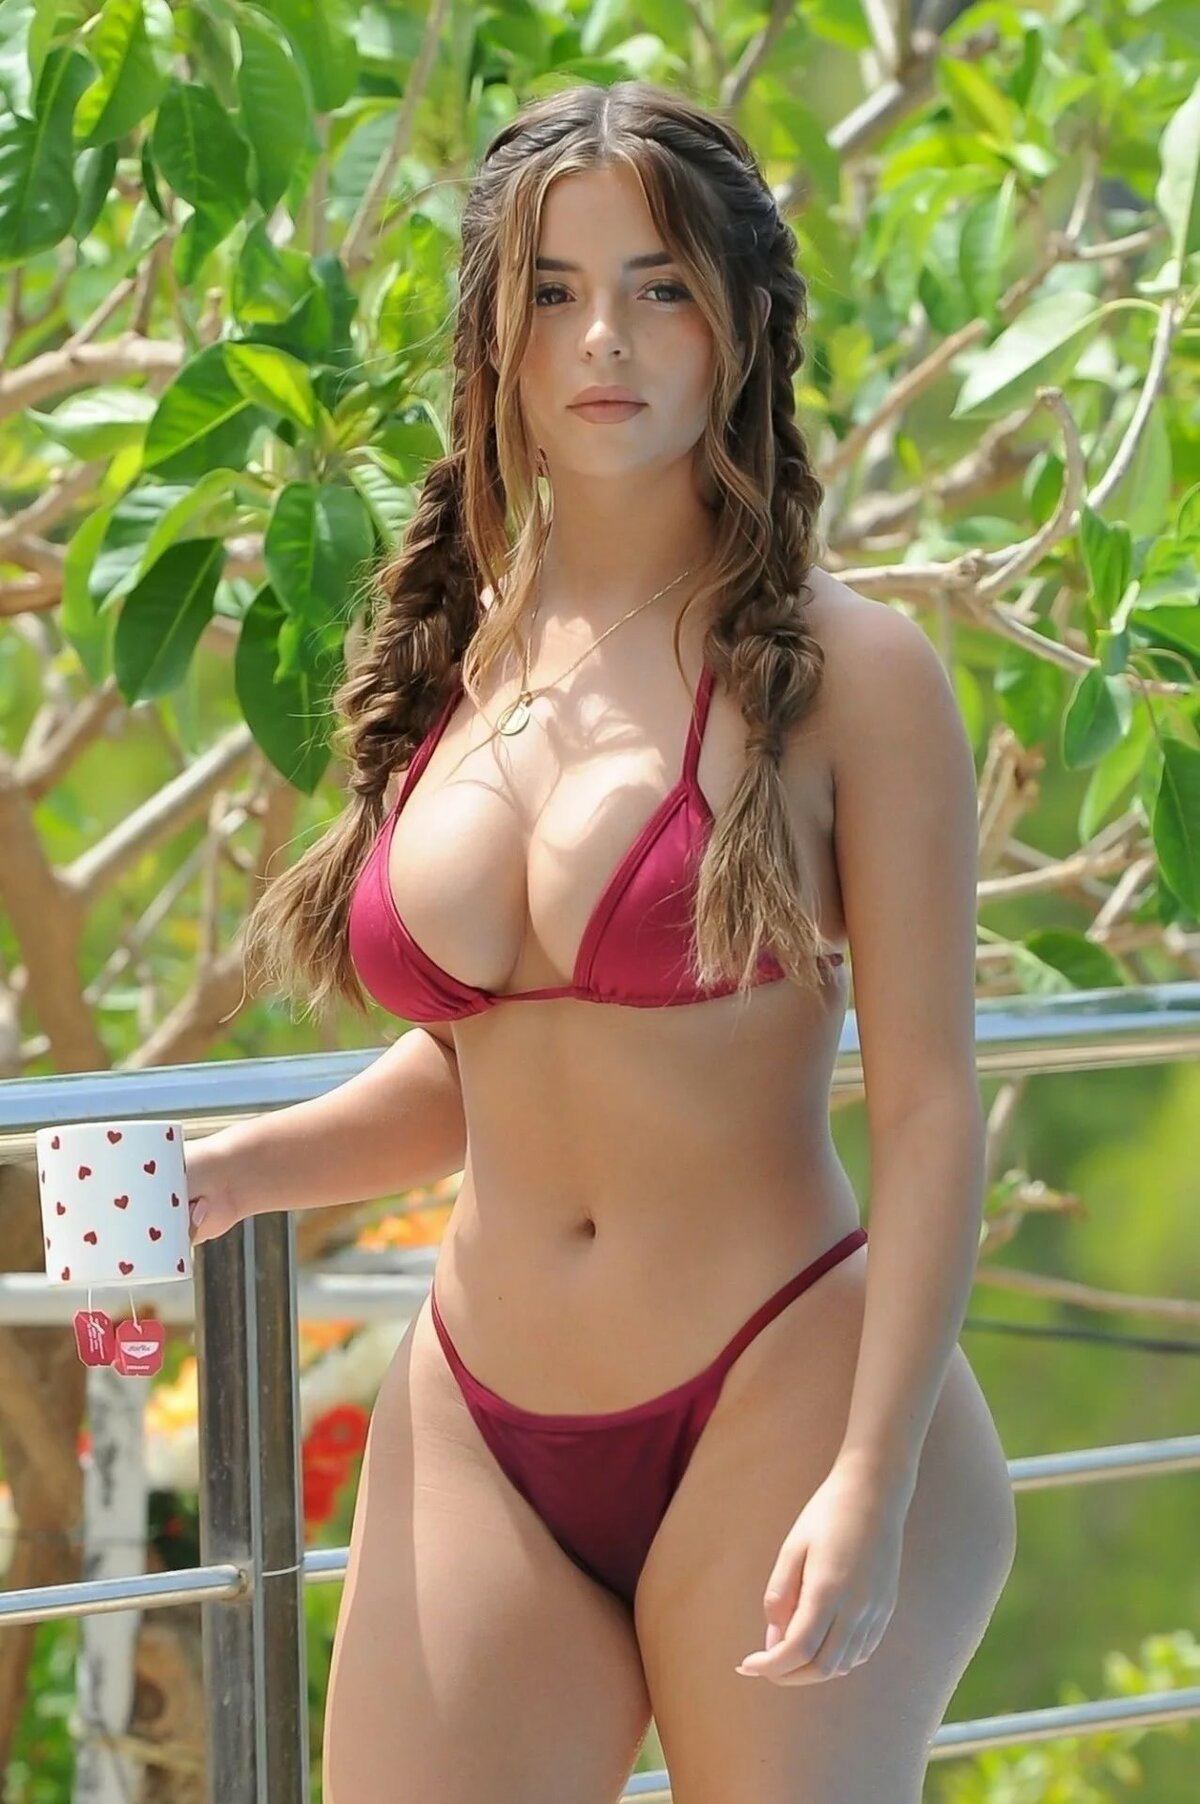 Young girl in red bikini, shoe fetish sites